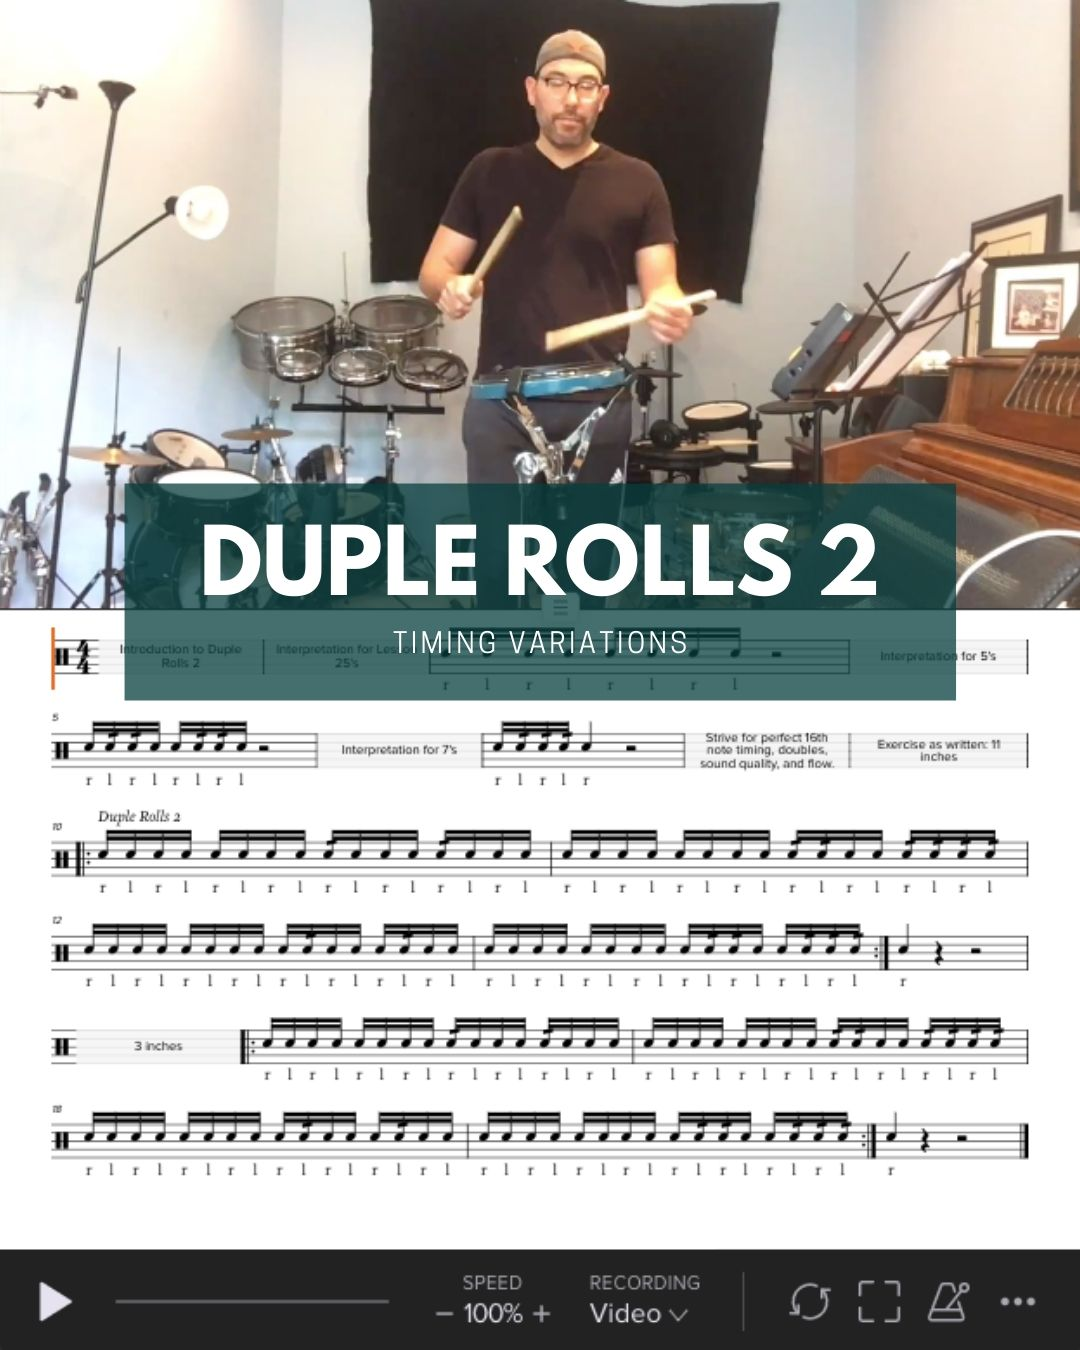 Duple Rolls 2